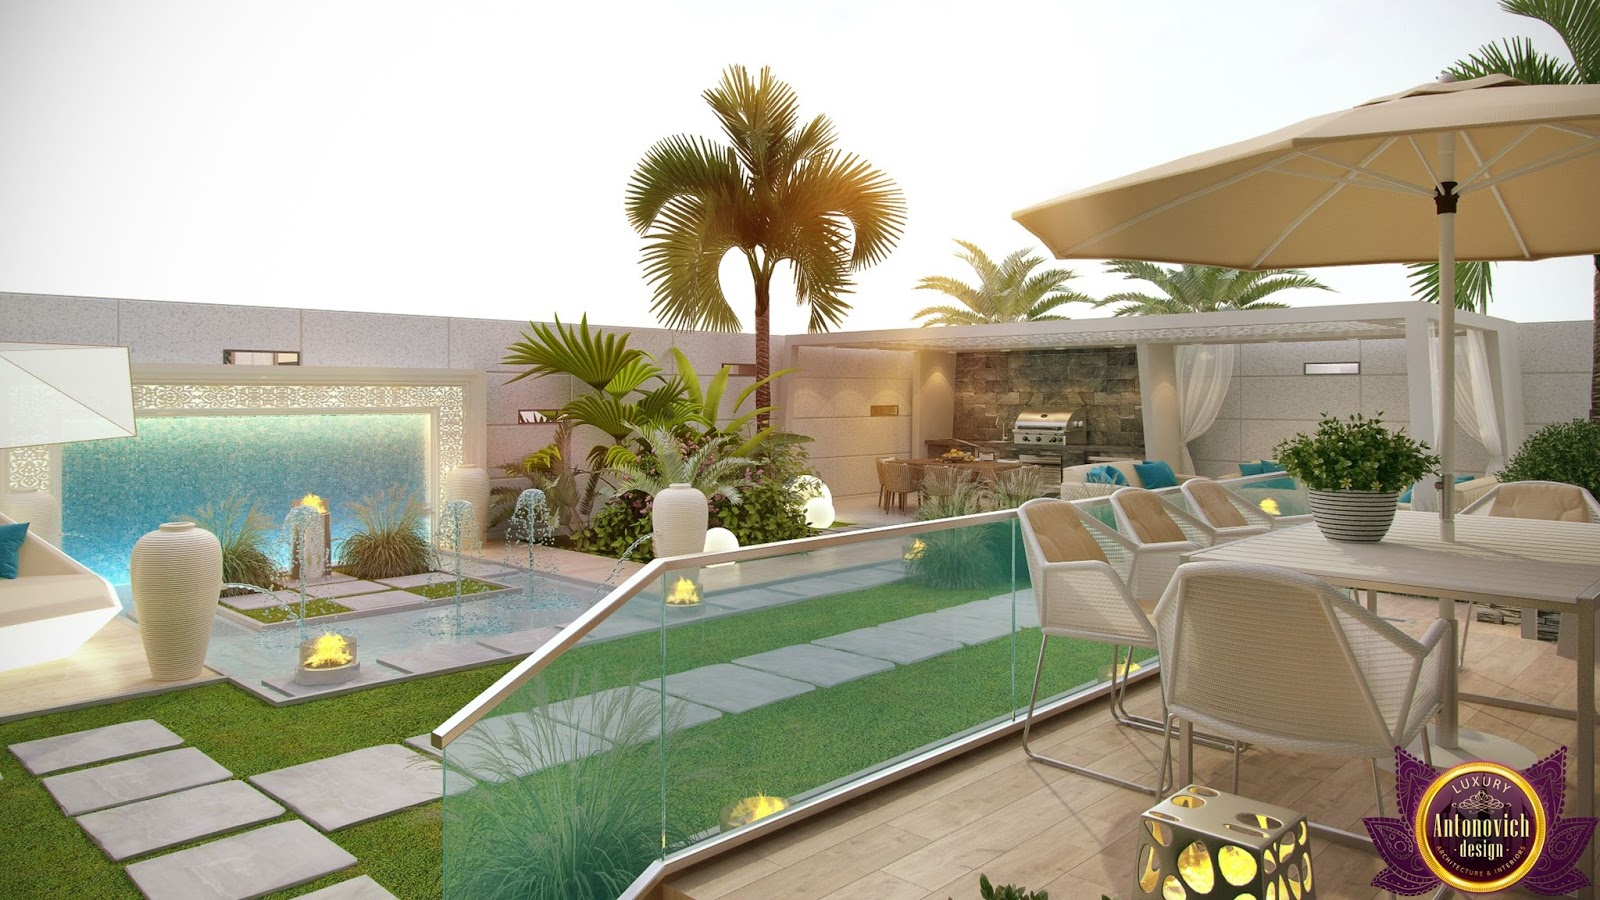 Kitchen Design Usa By Katrina Antonovich: Kenyadesign: Landscaping Ideas Of Katrina Antonovich